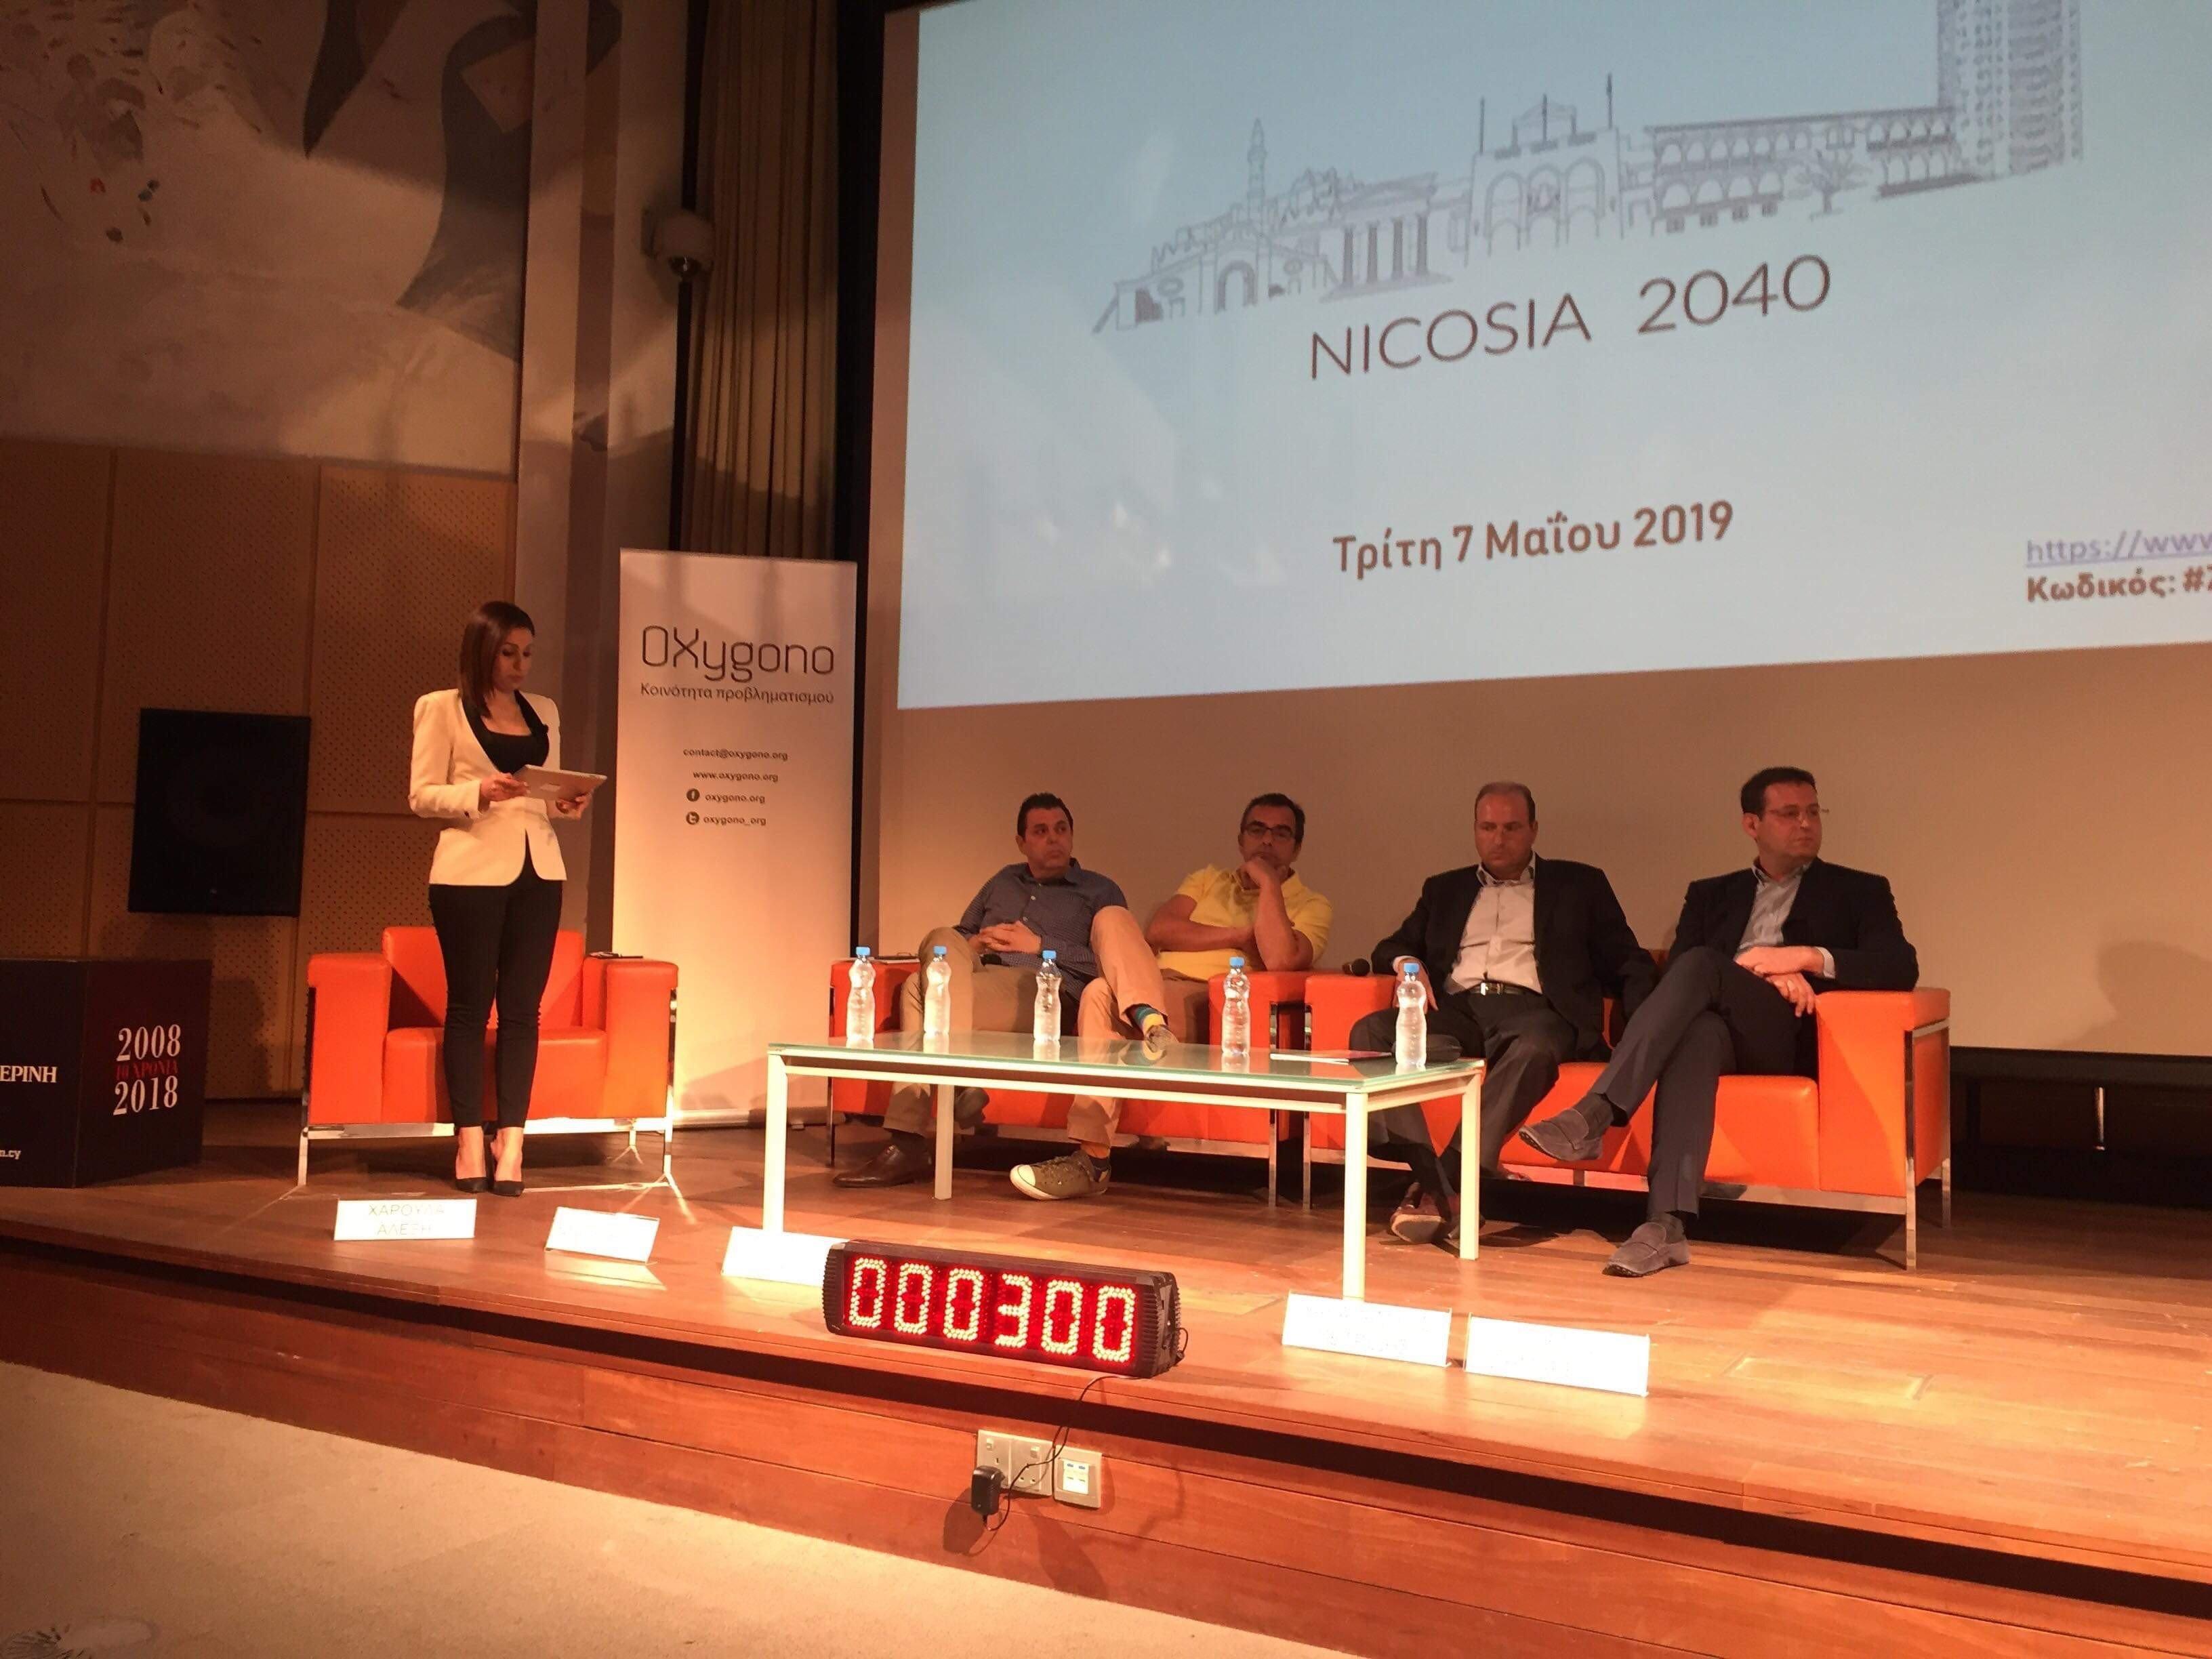 Nicosia2040